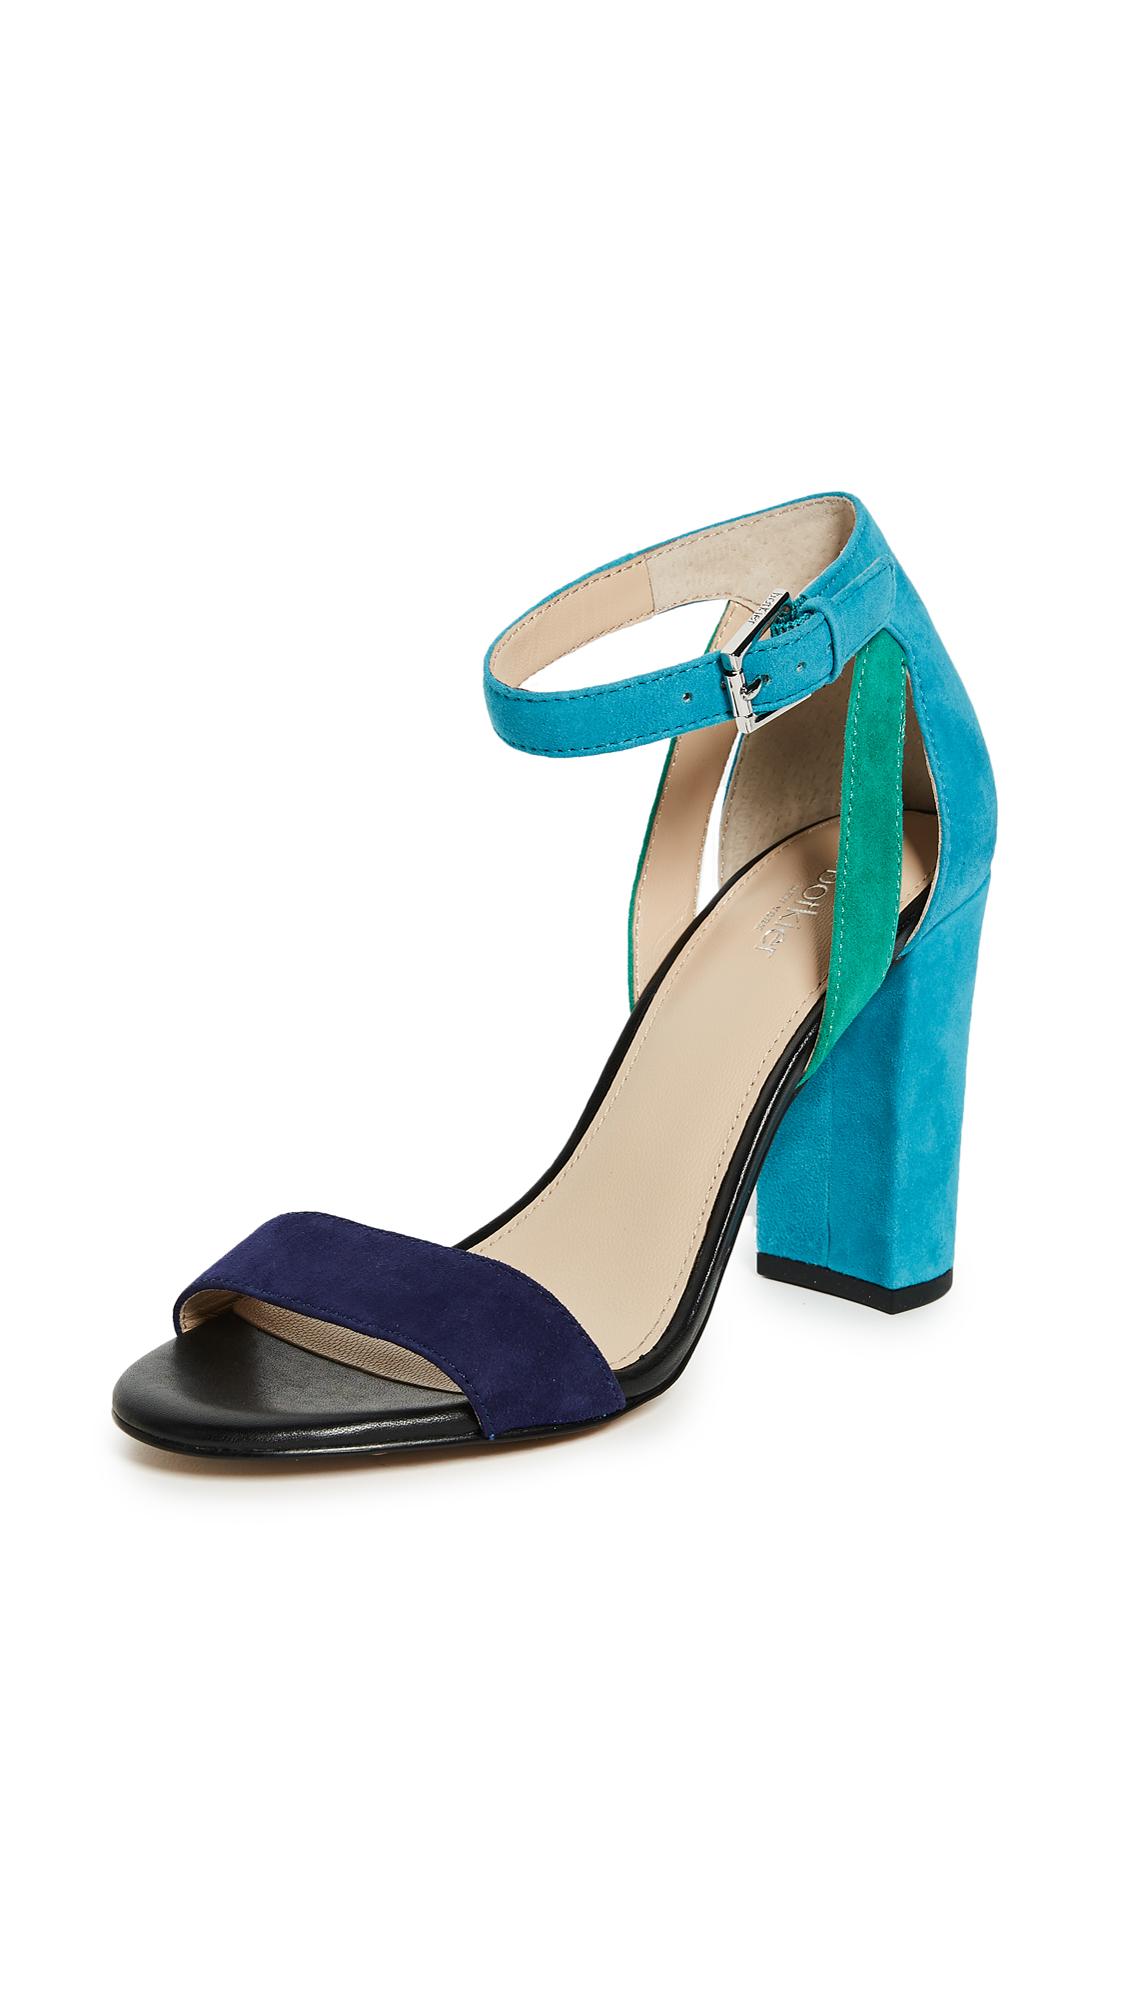 Botkier Gianna Colorblock Sandals - Ultramarine Combo